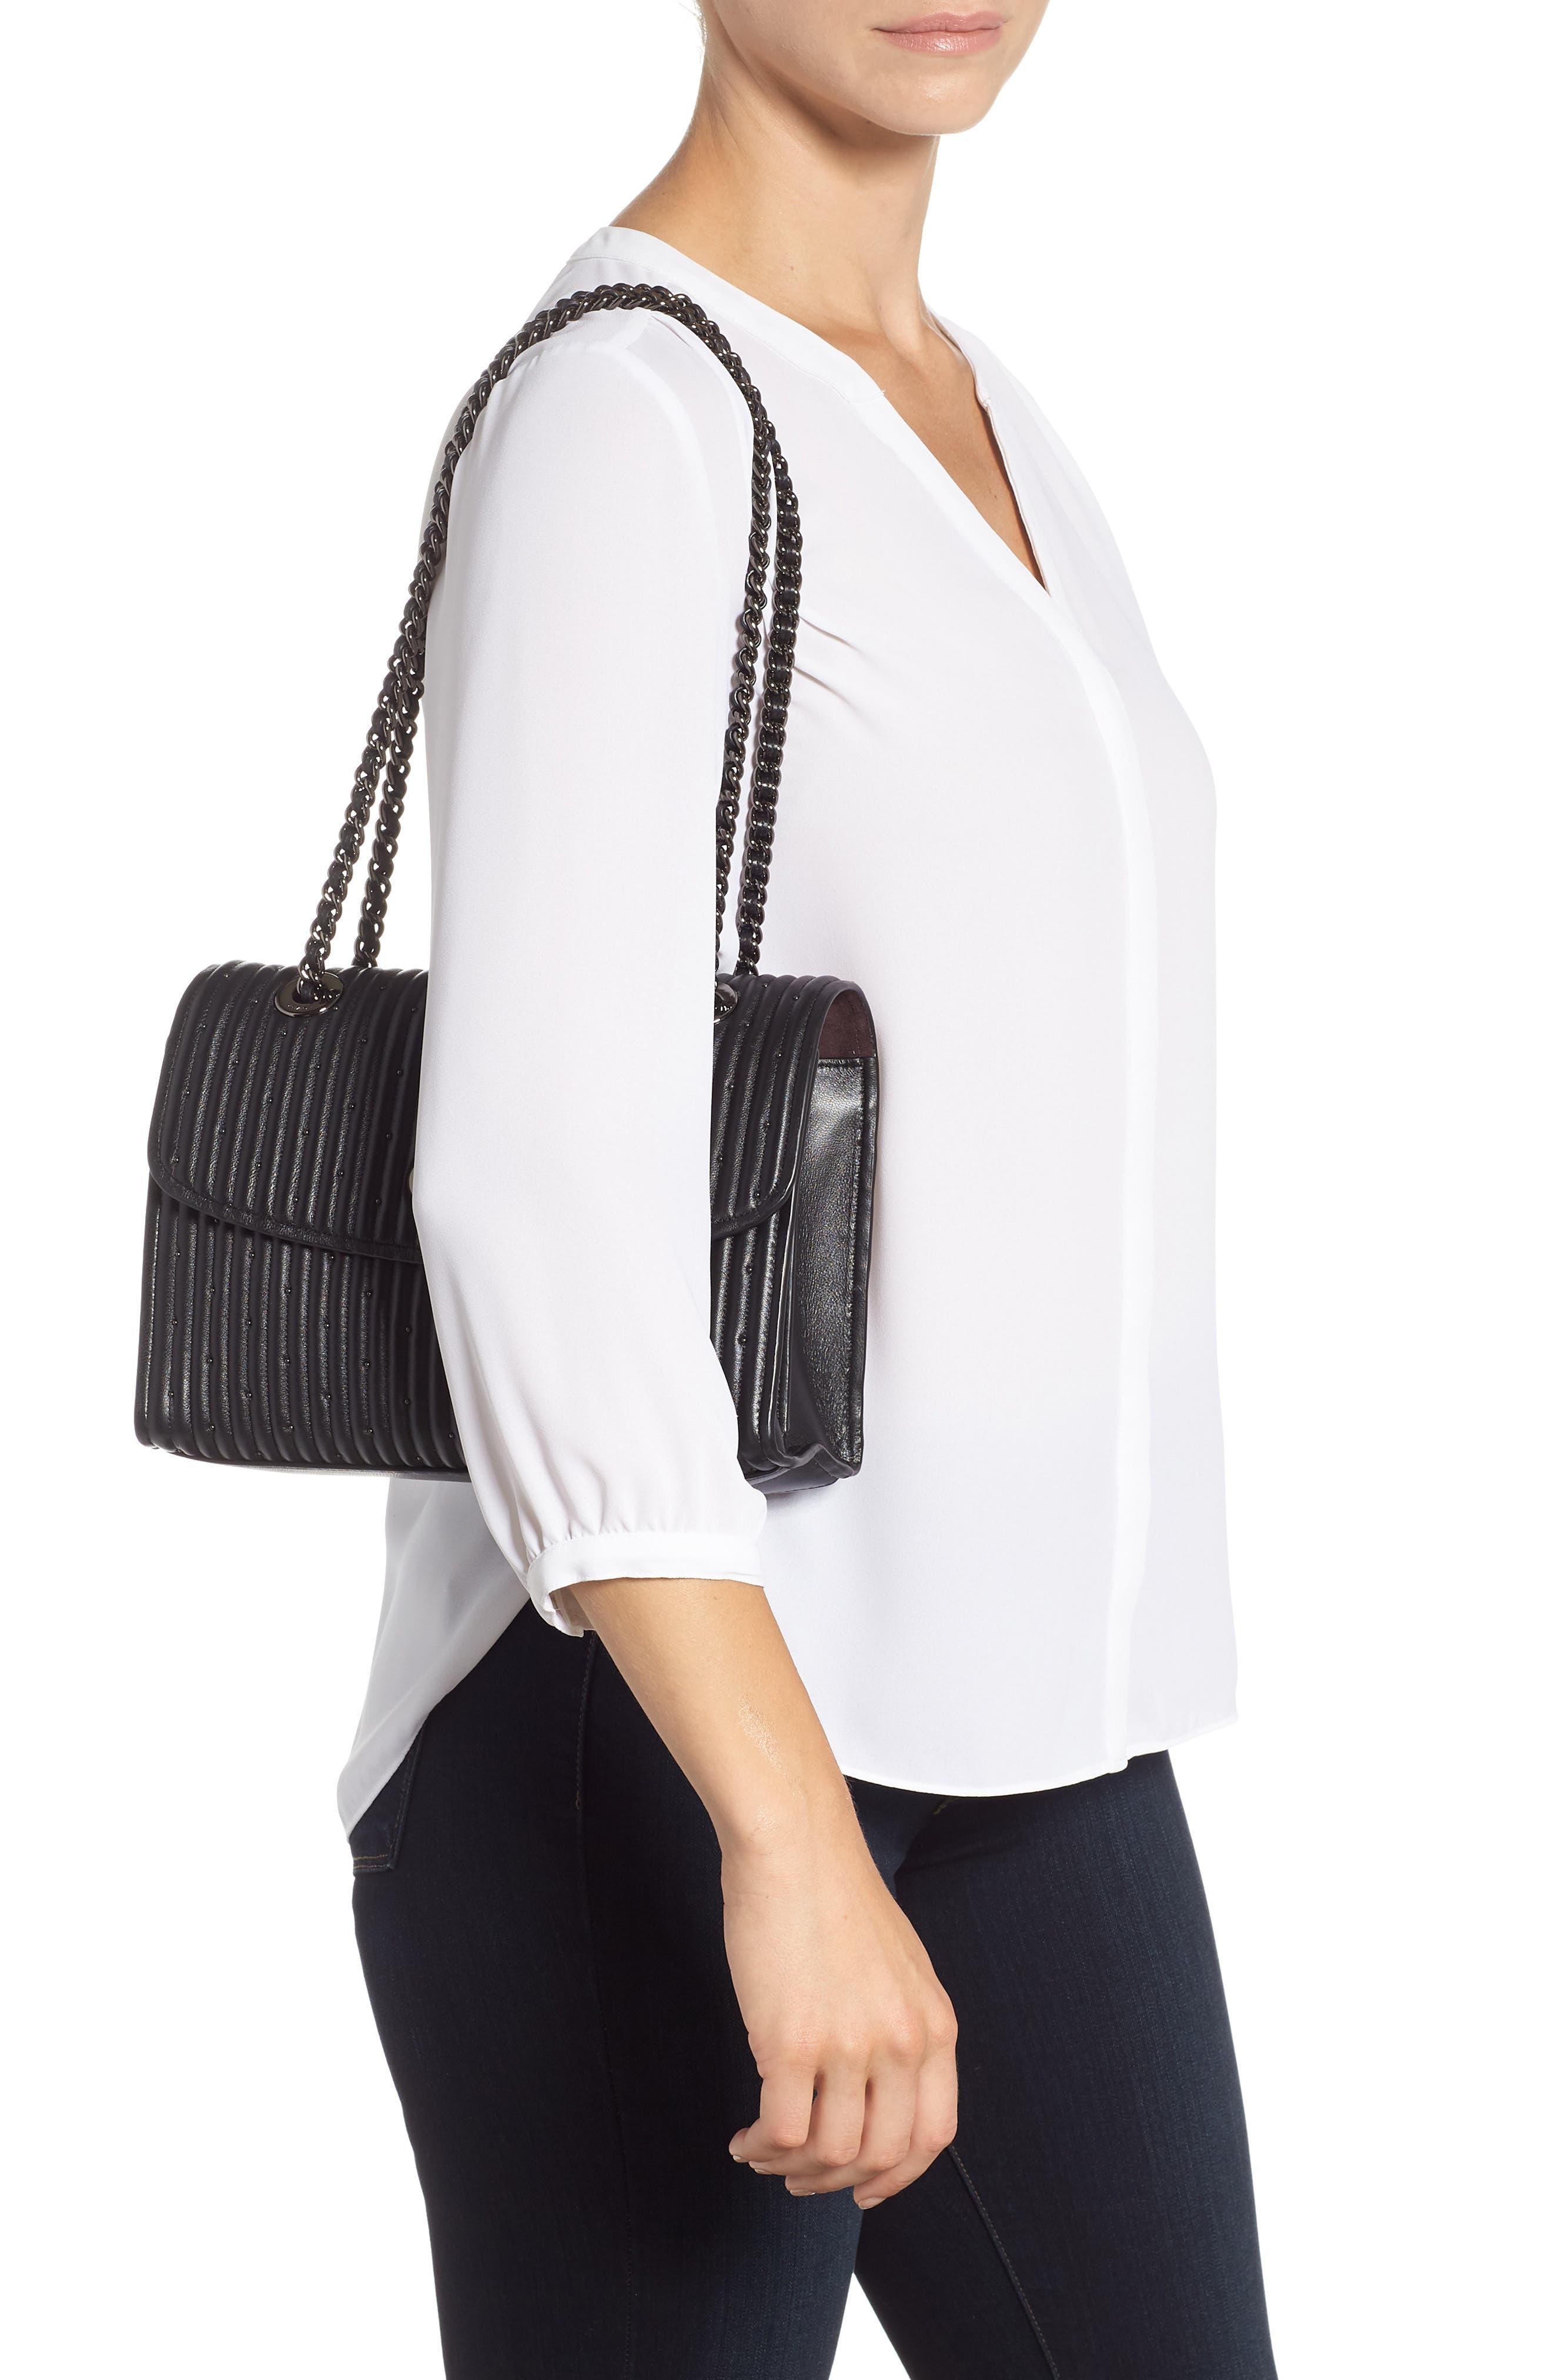 COACH, Parker Quilted Leather Shoulder Bag, Alternate thumbnail 2, color, BLACK